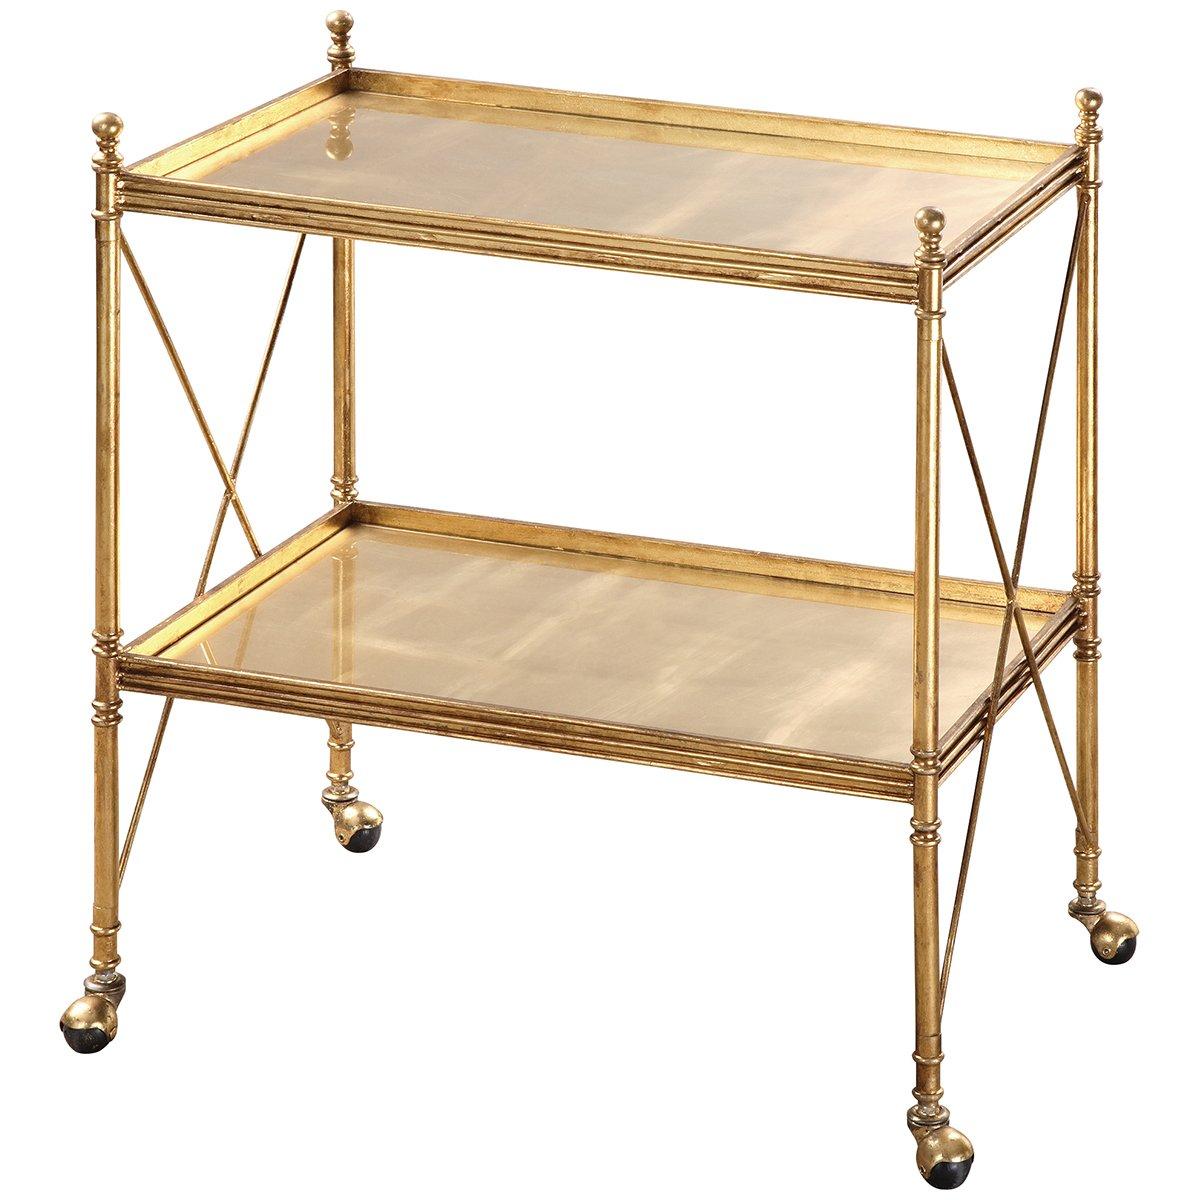 Uttermost 24464 Amaranto Serving Cart, Gold